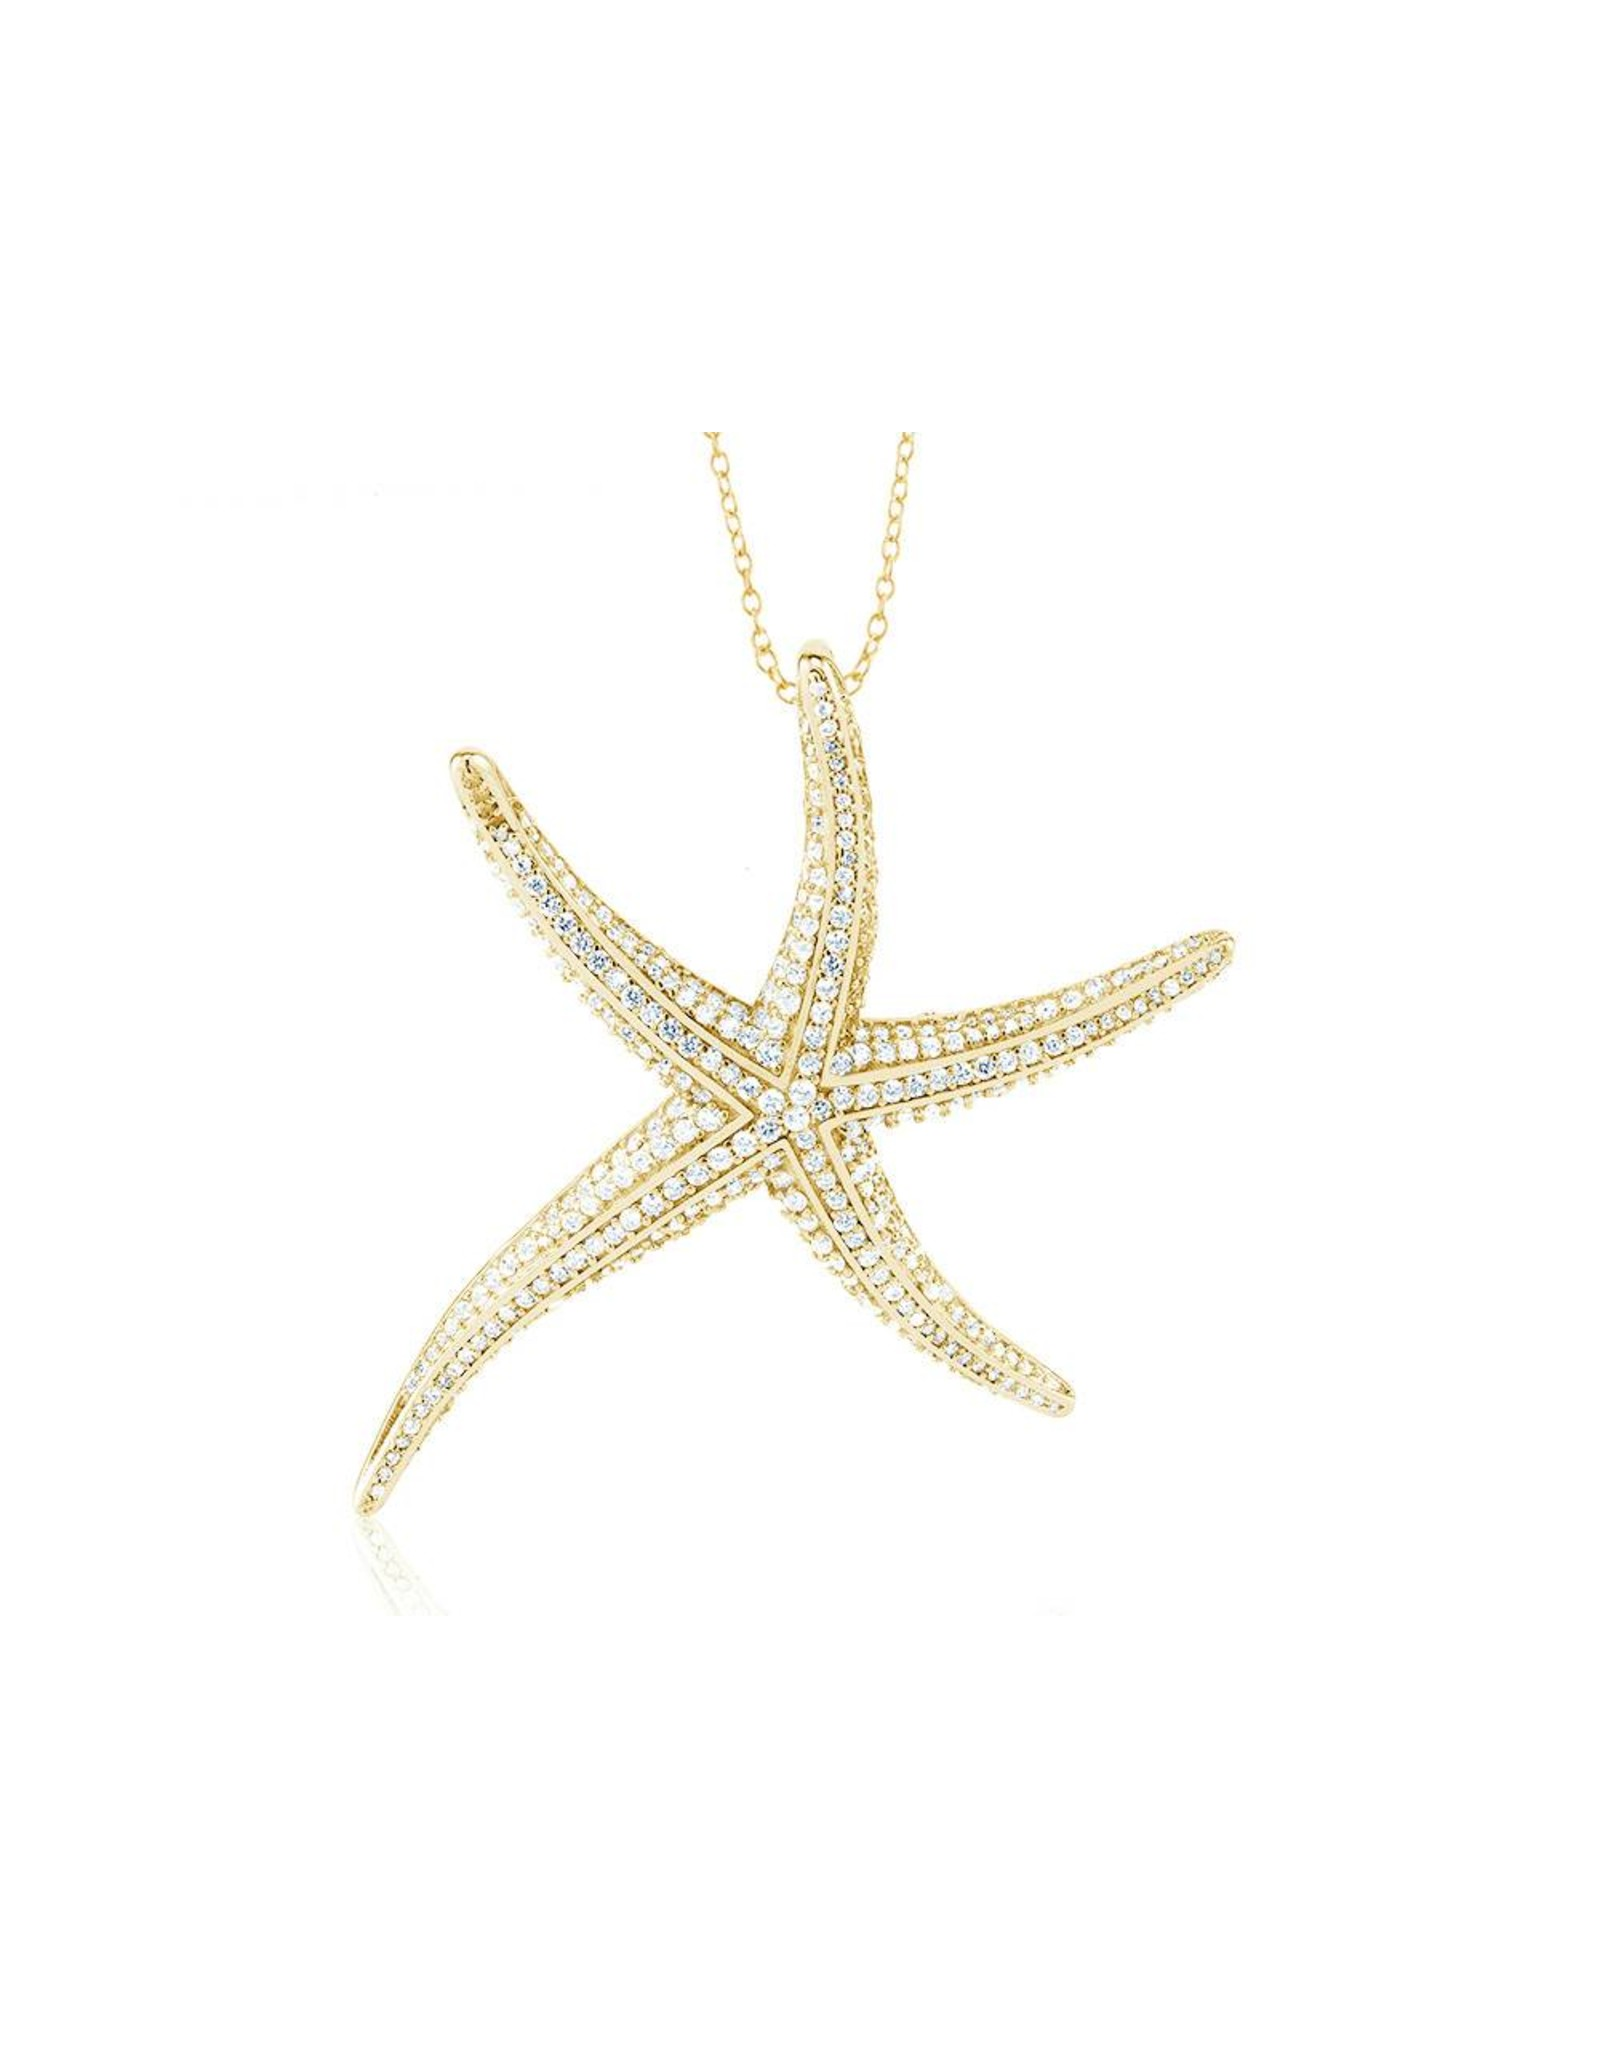 Starfish - Large CZ Gold Filled